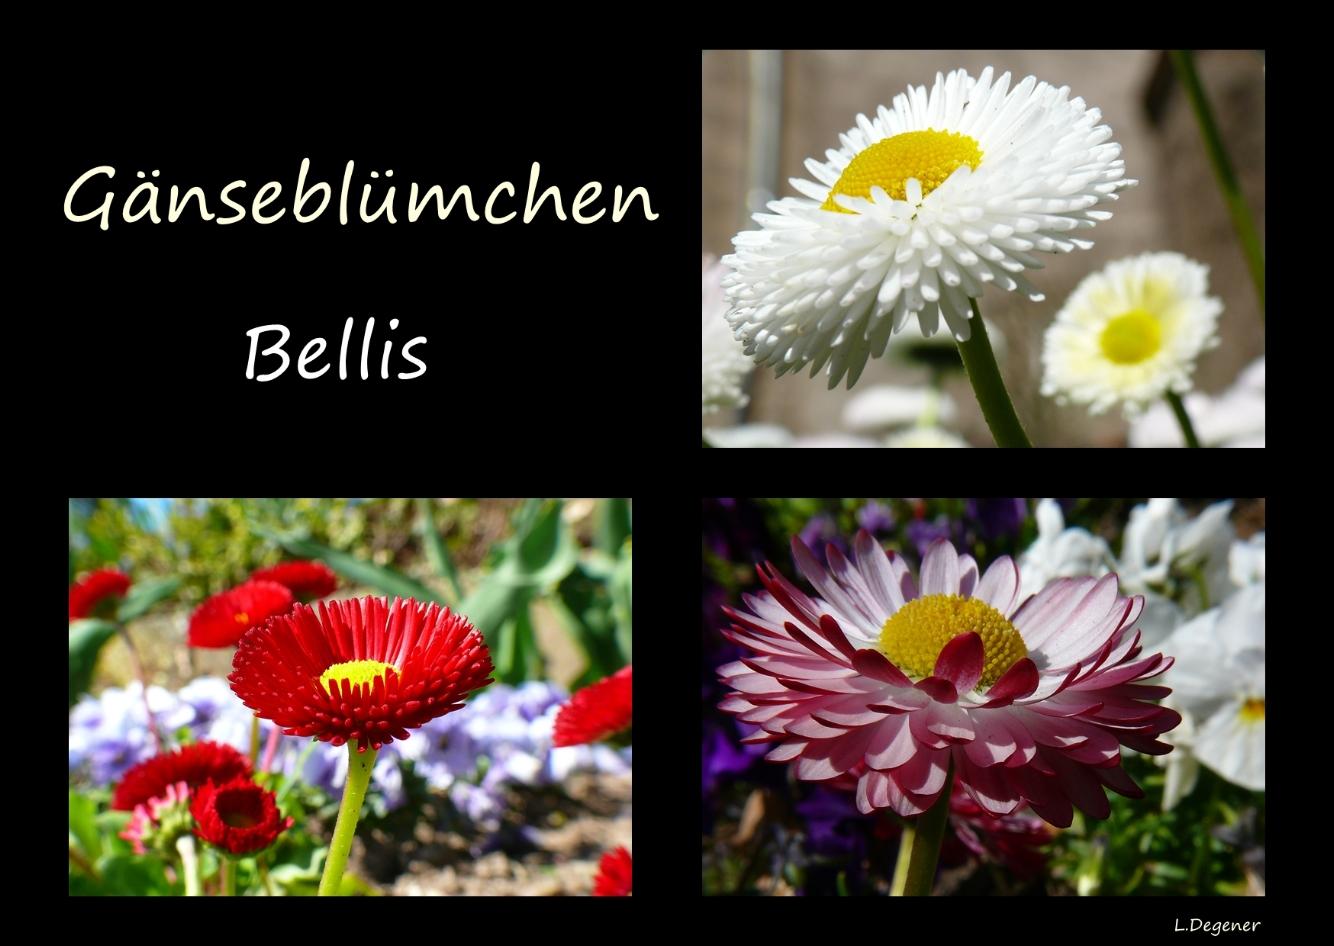 Gänseblümchen (Bellis)